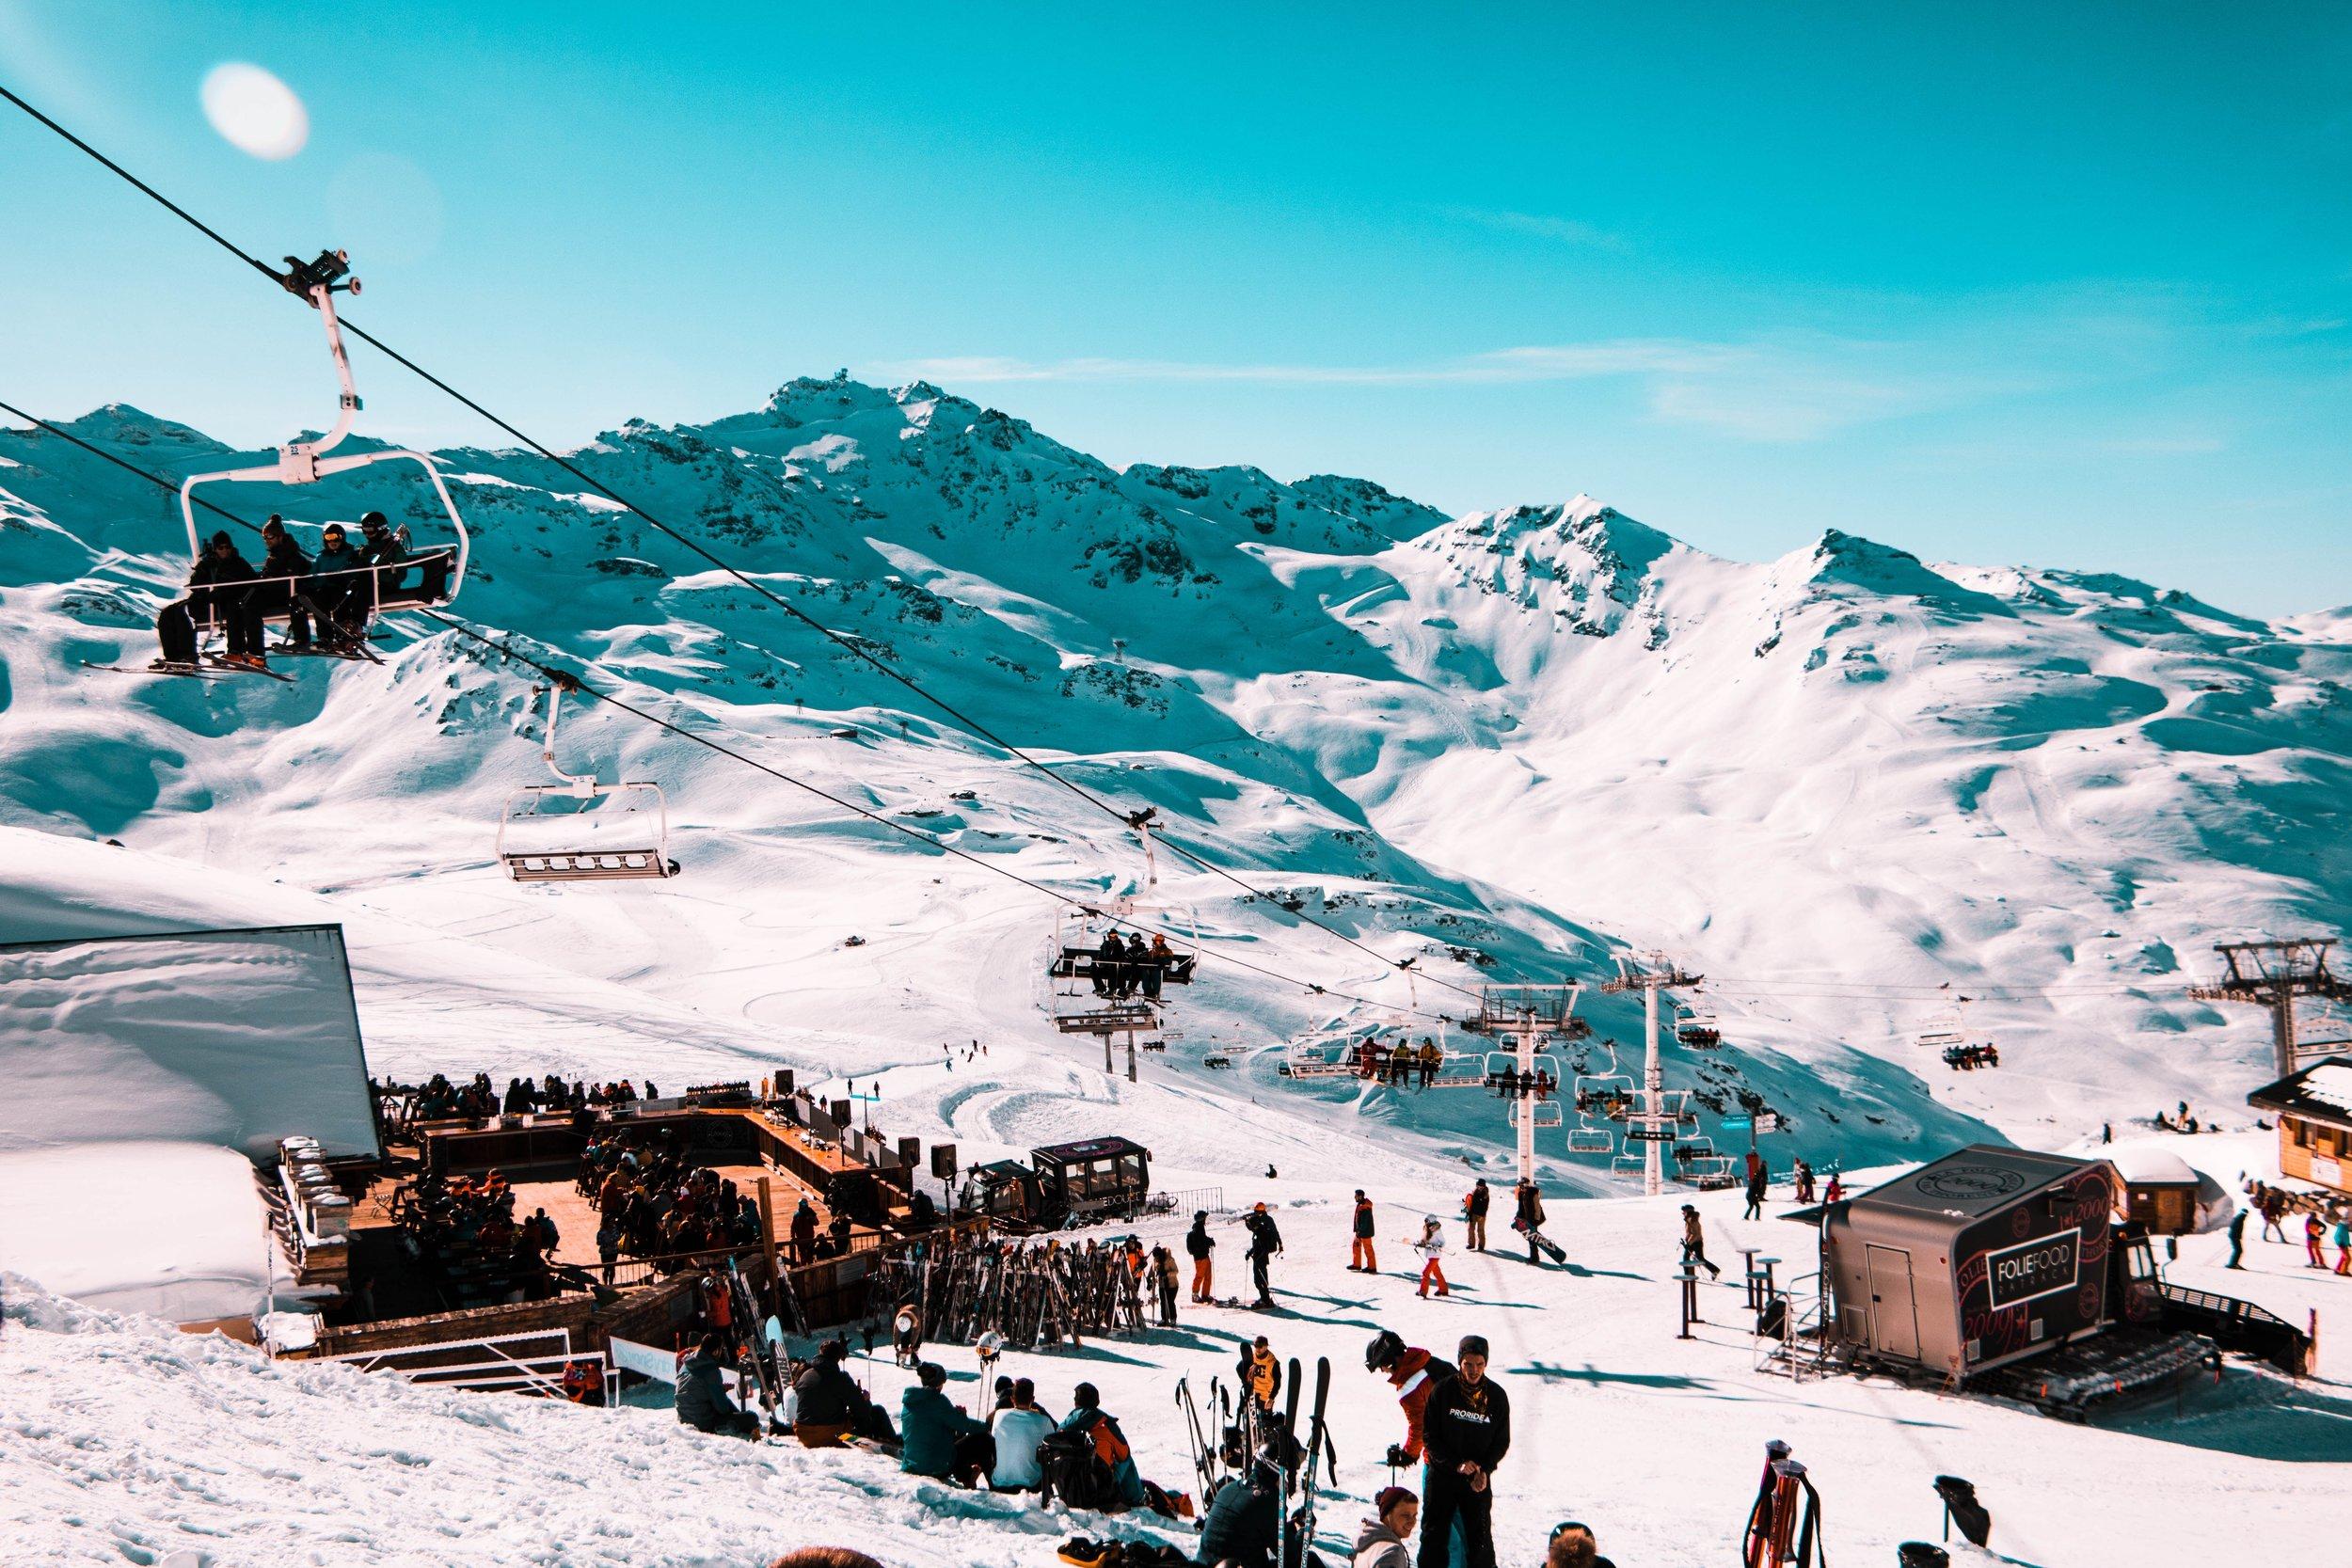 Apres ski life at it's finest.